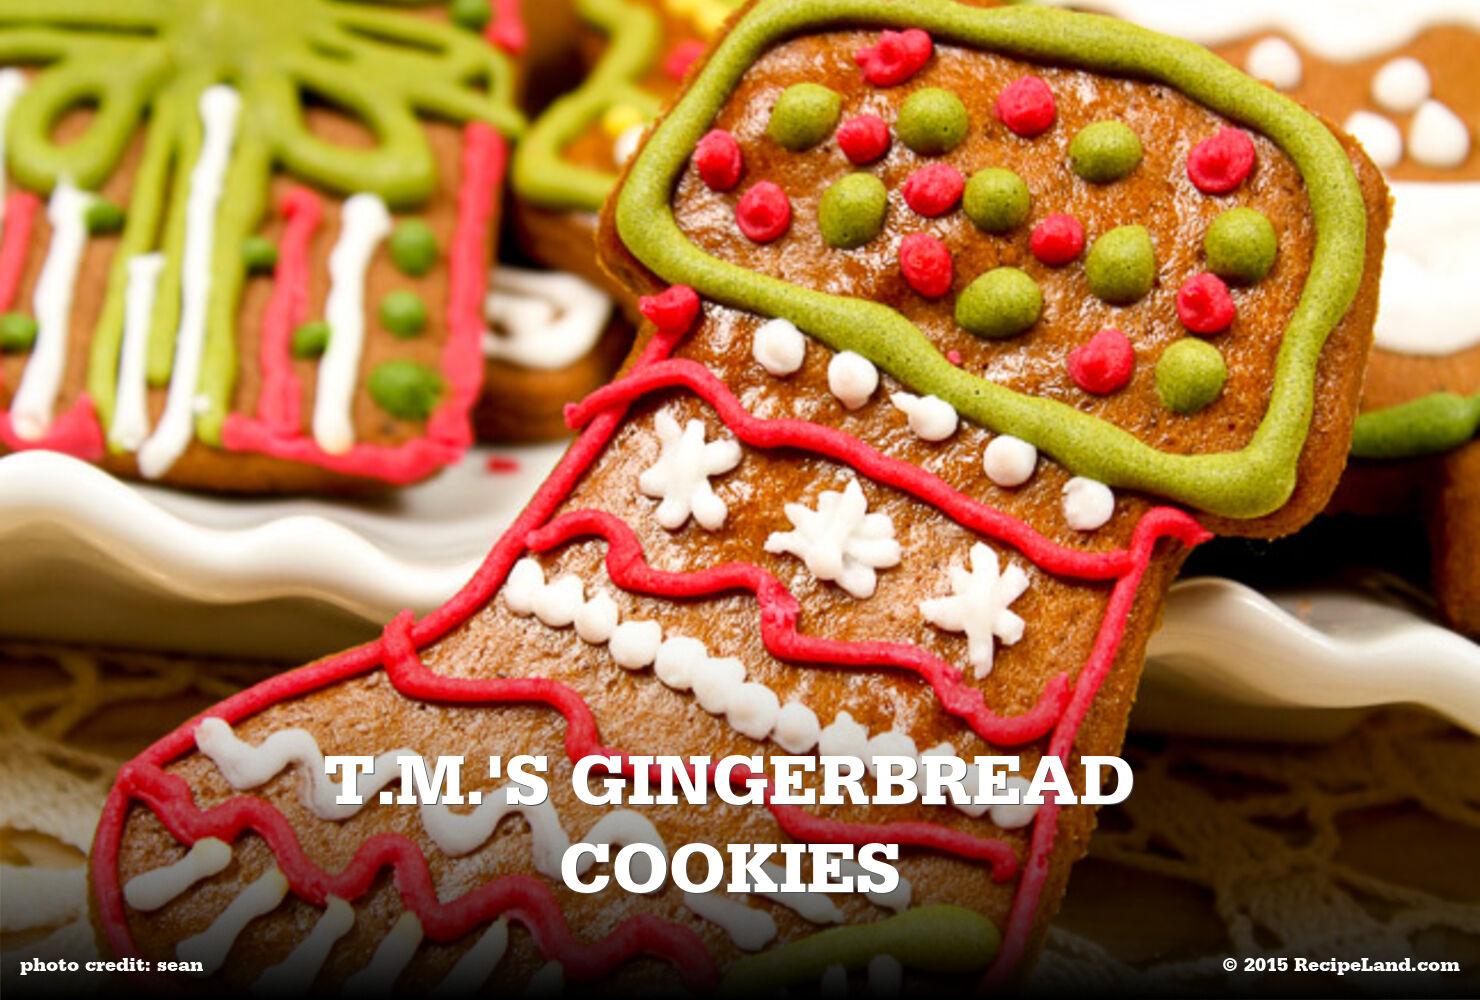 T.M.'s Gingerbread Cookies